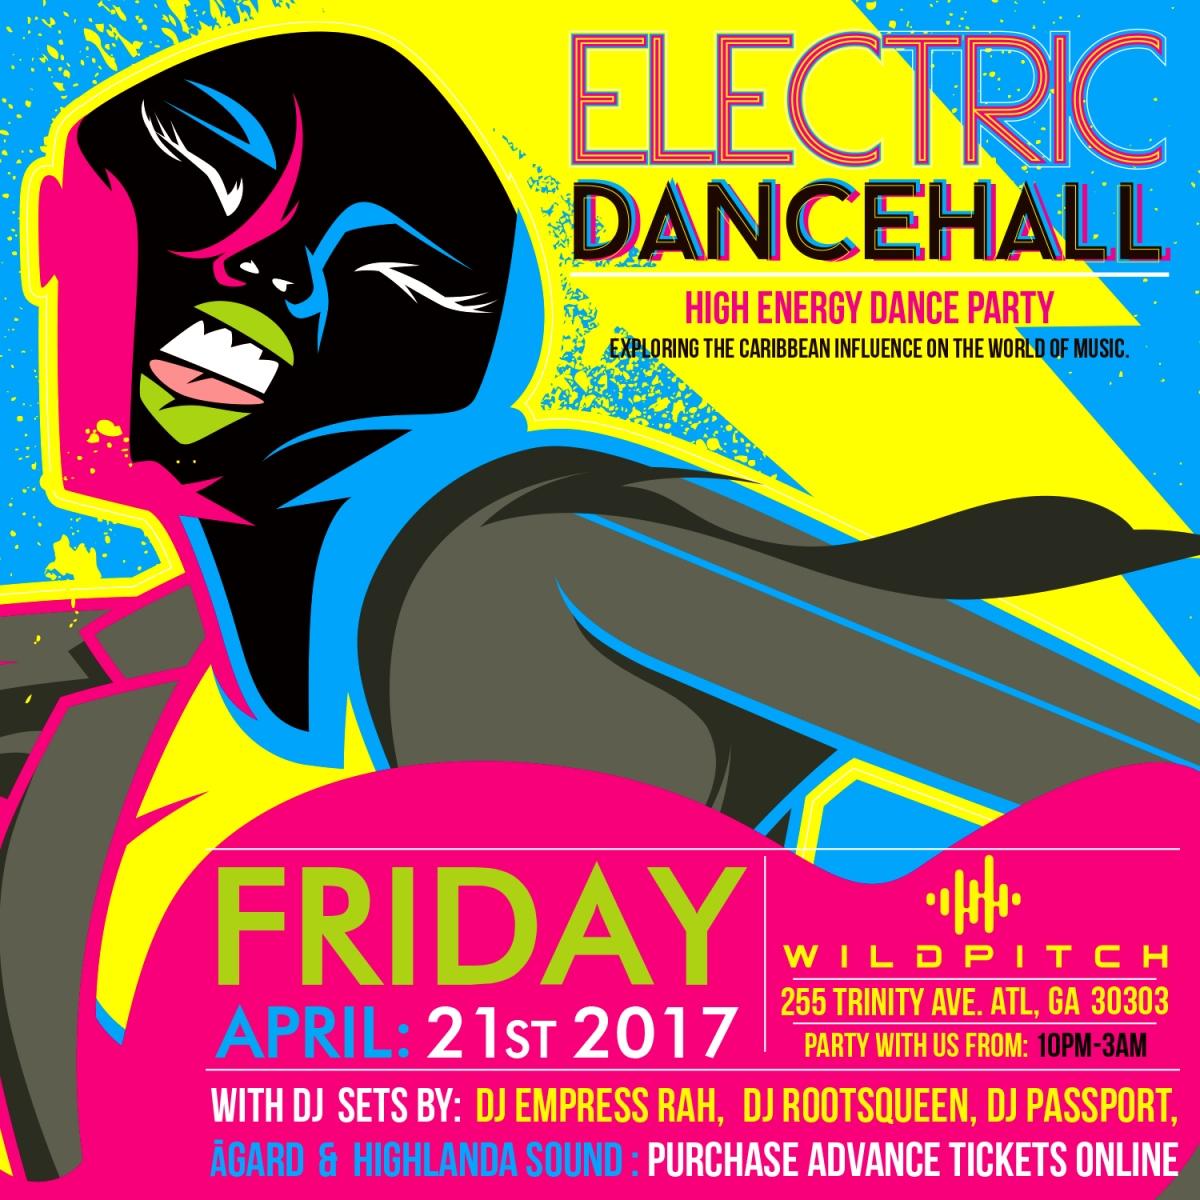 Electric Dancehall | Friday April 21, 2017 | Atlanta, GA